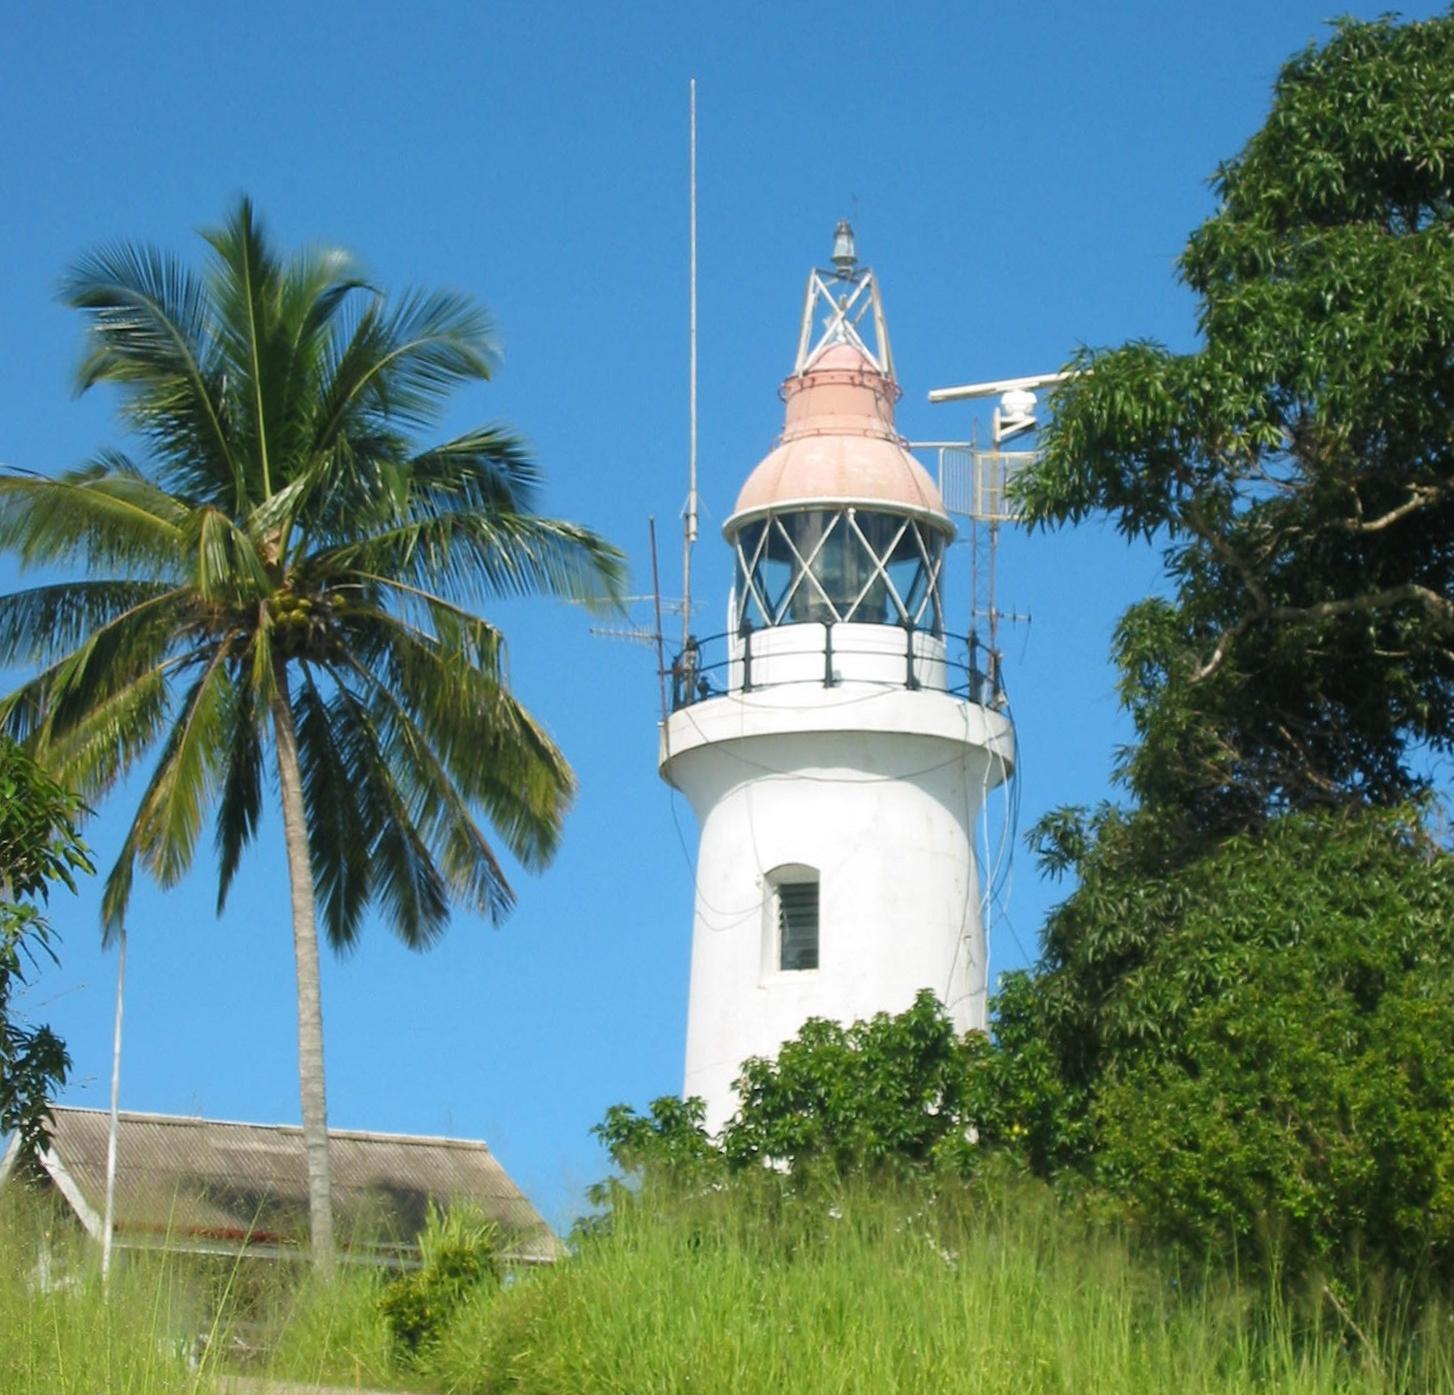 Boca Light - Chacachacare, Trinidad